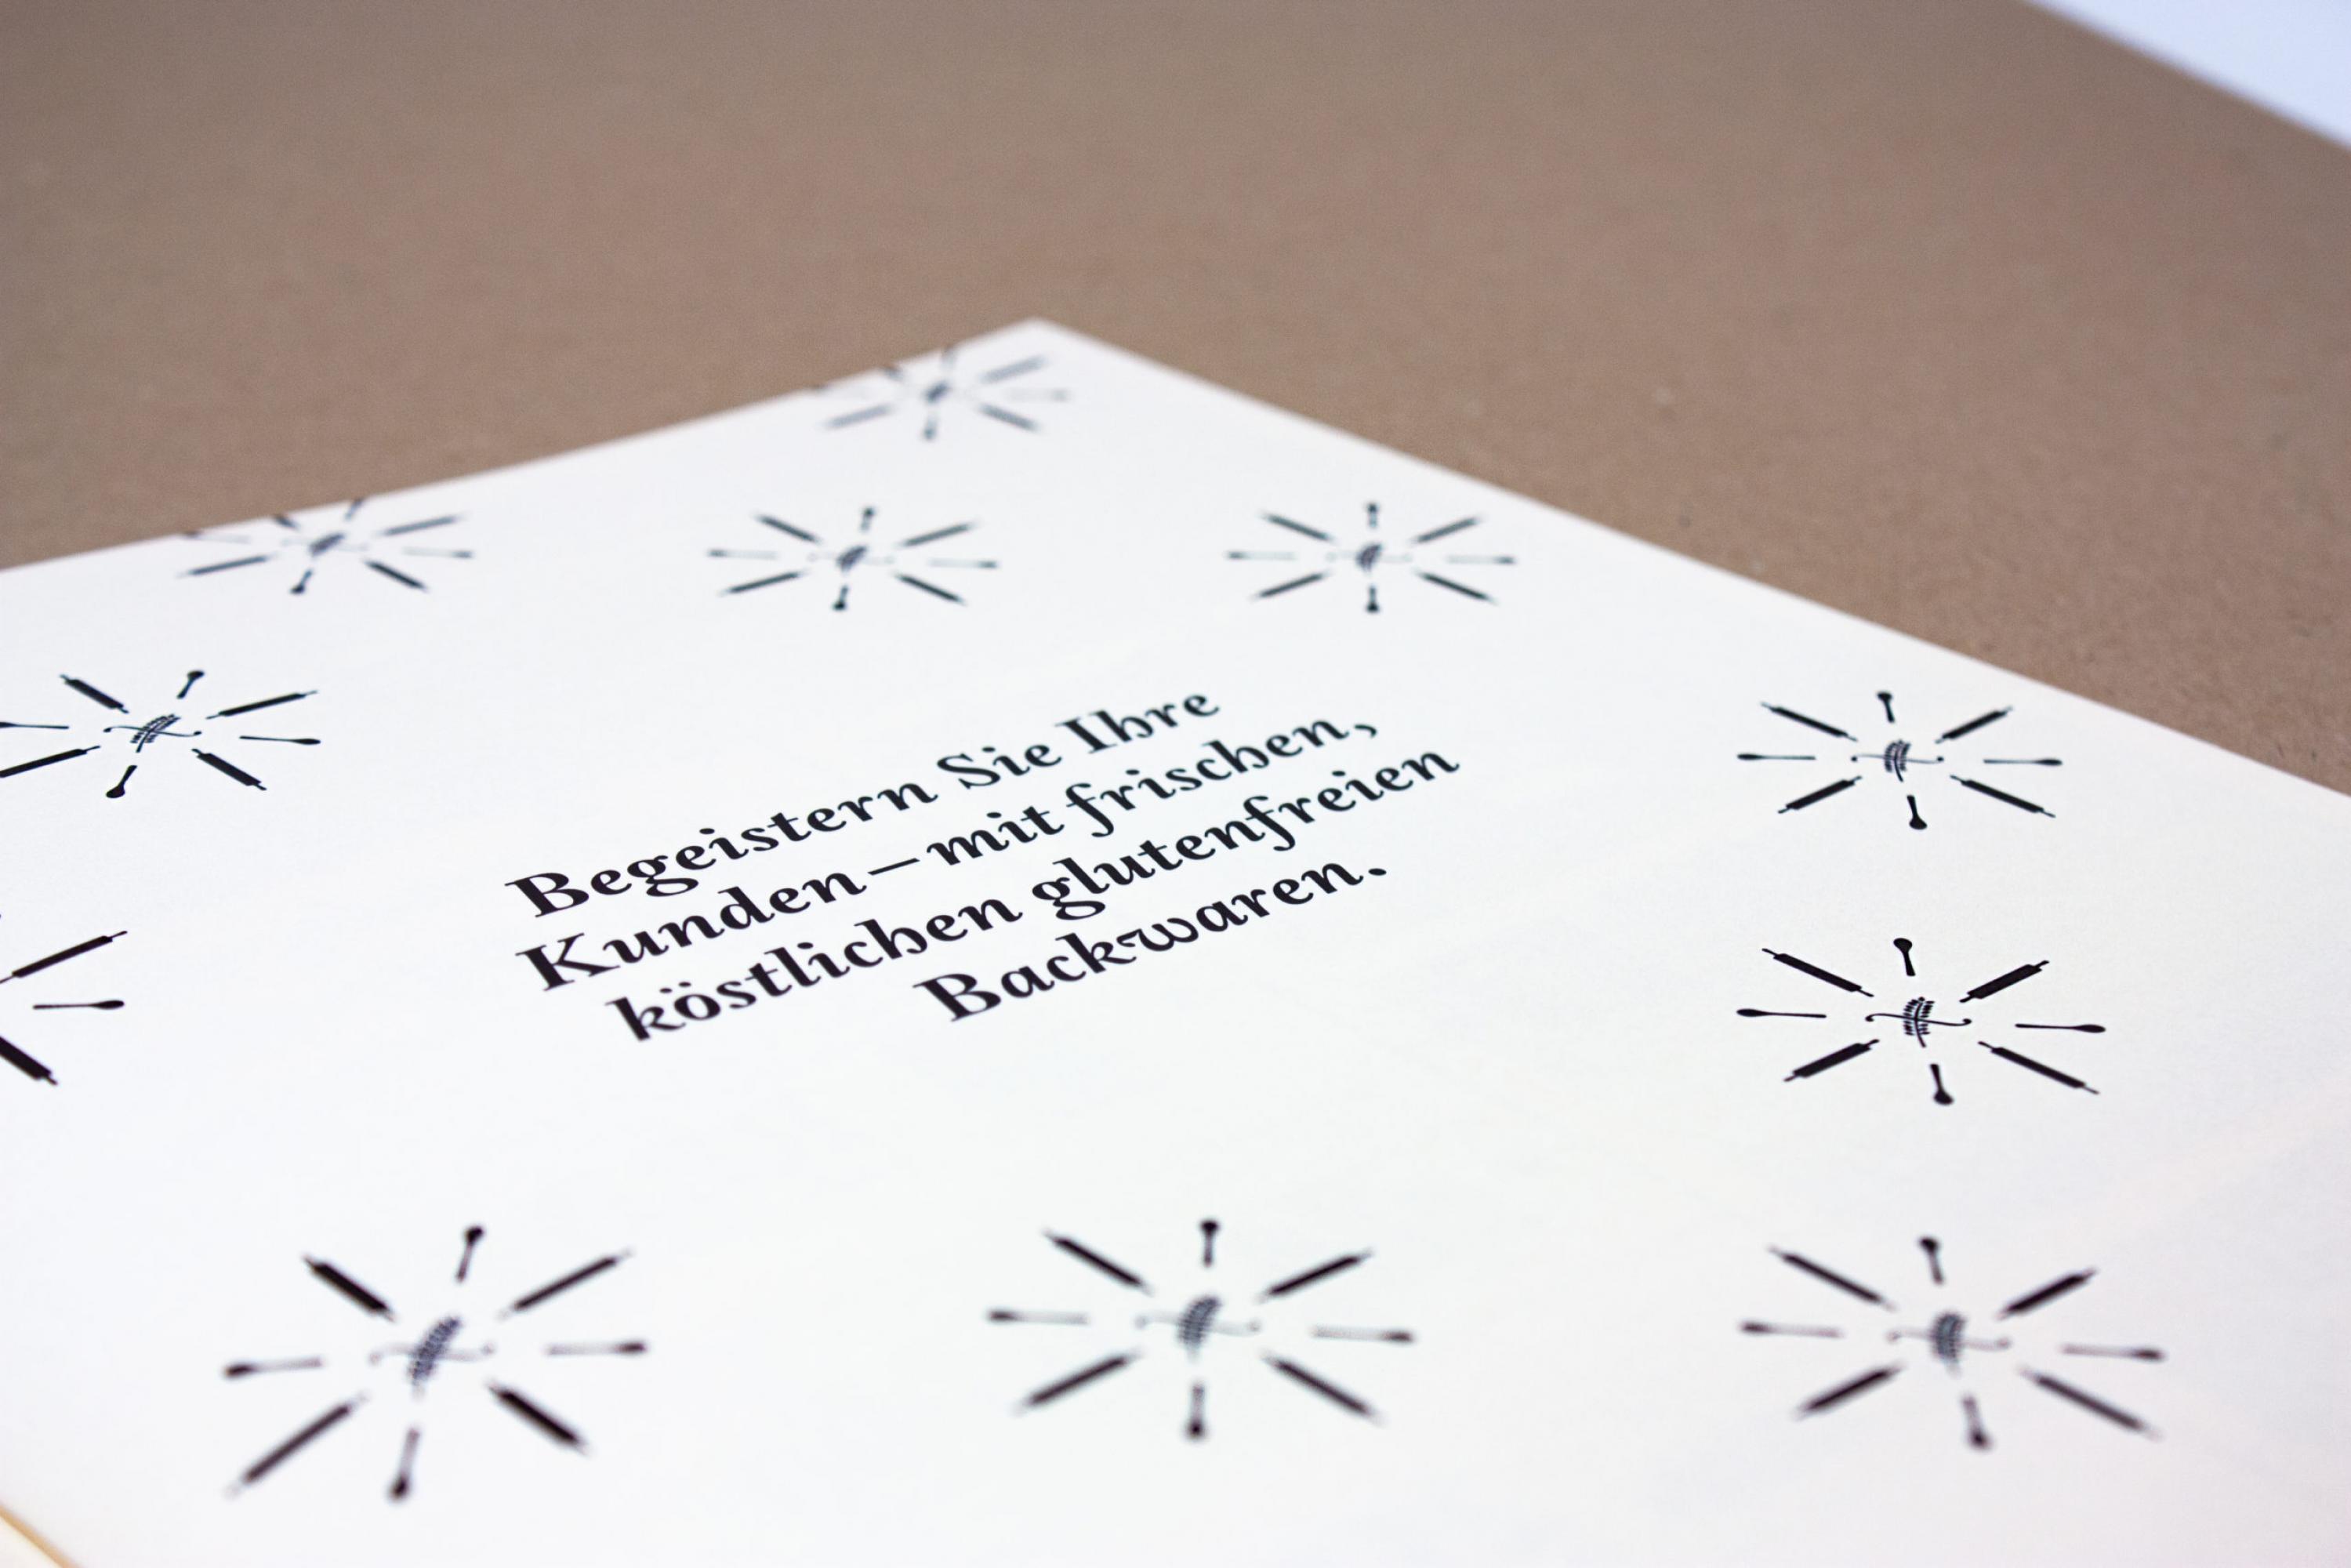 Print-broschuere-jute-baeckerei-formlos-corporate-design-7